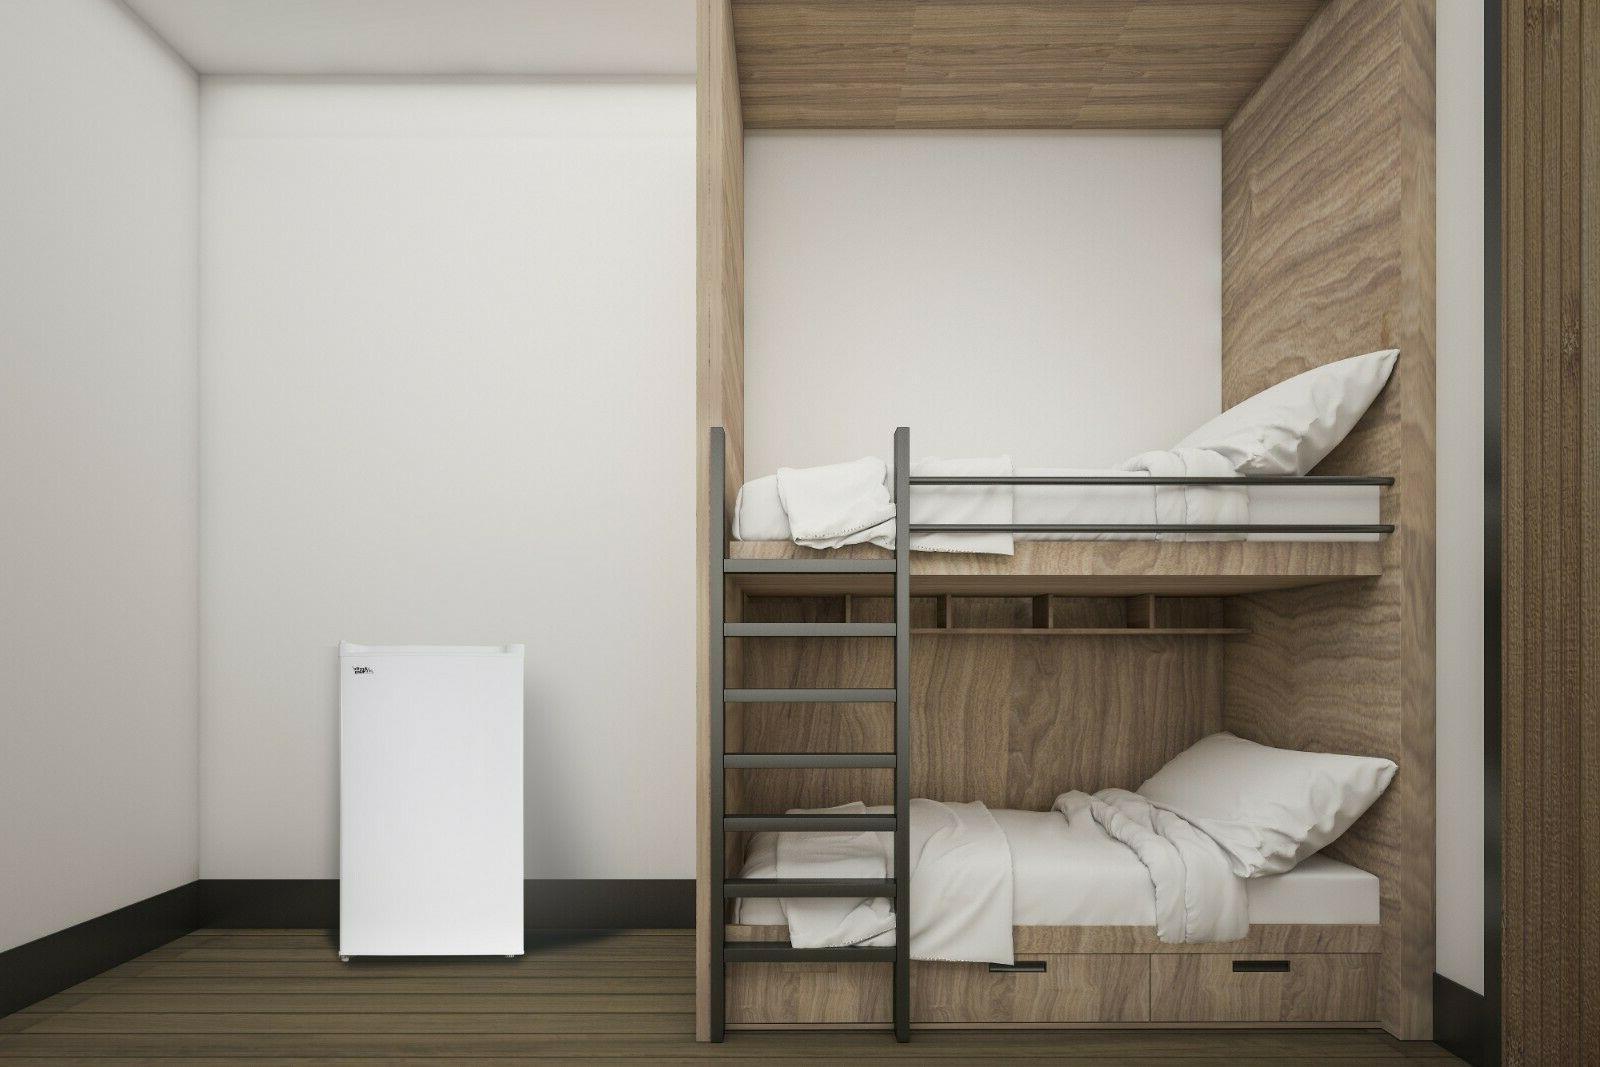 Arctic King Upright Freezer 3 Ft Storage Apartment Garage White